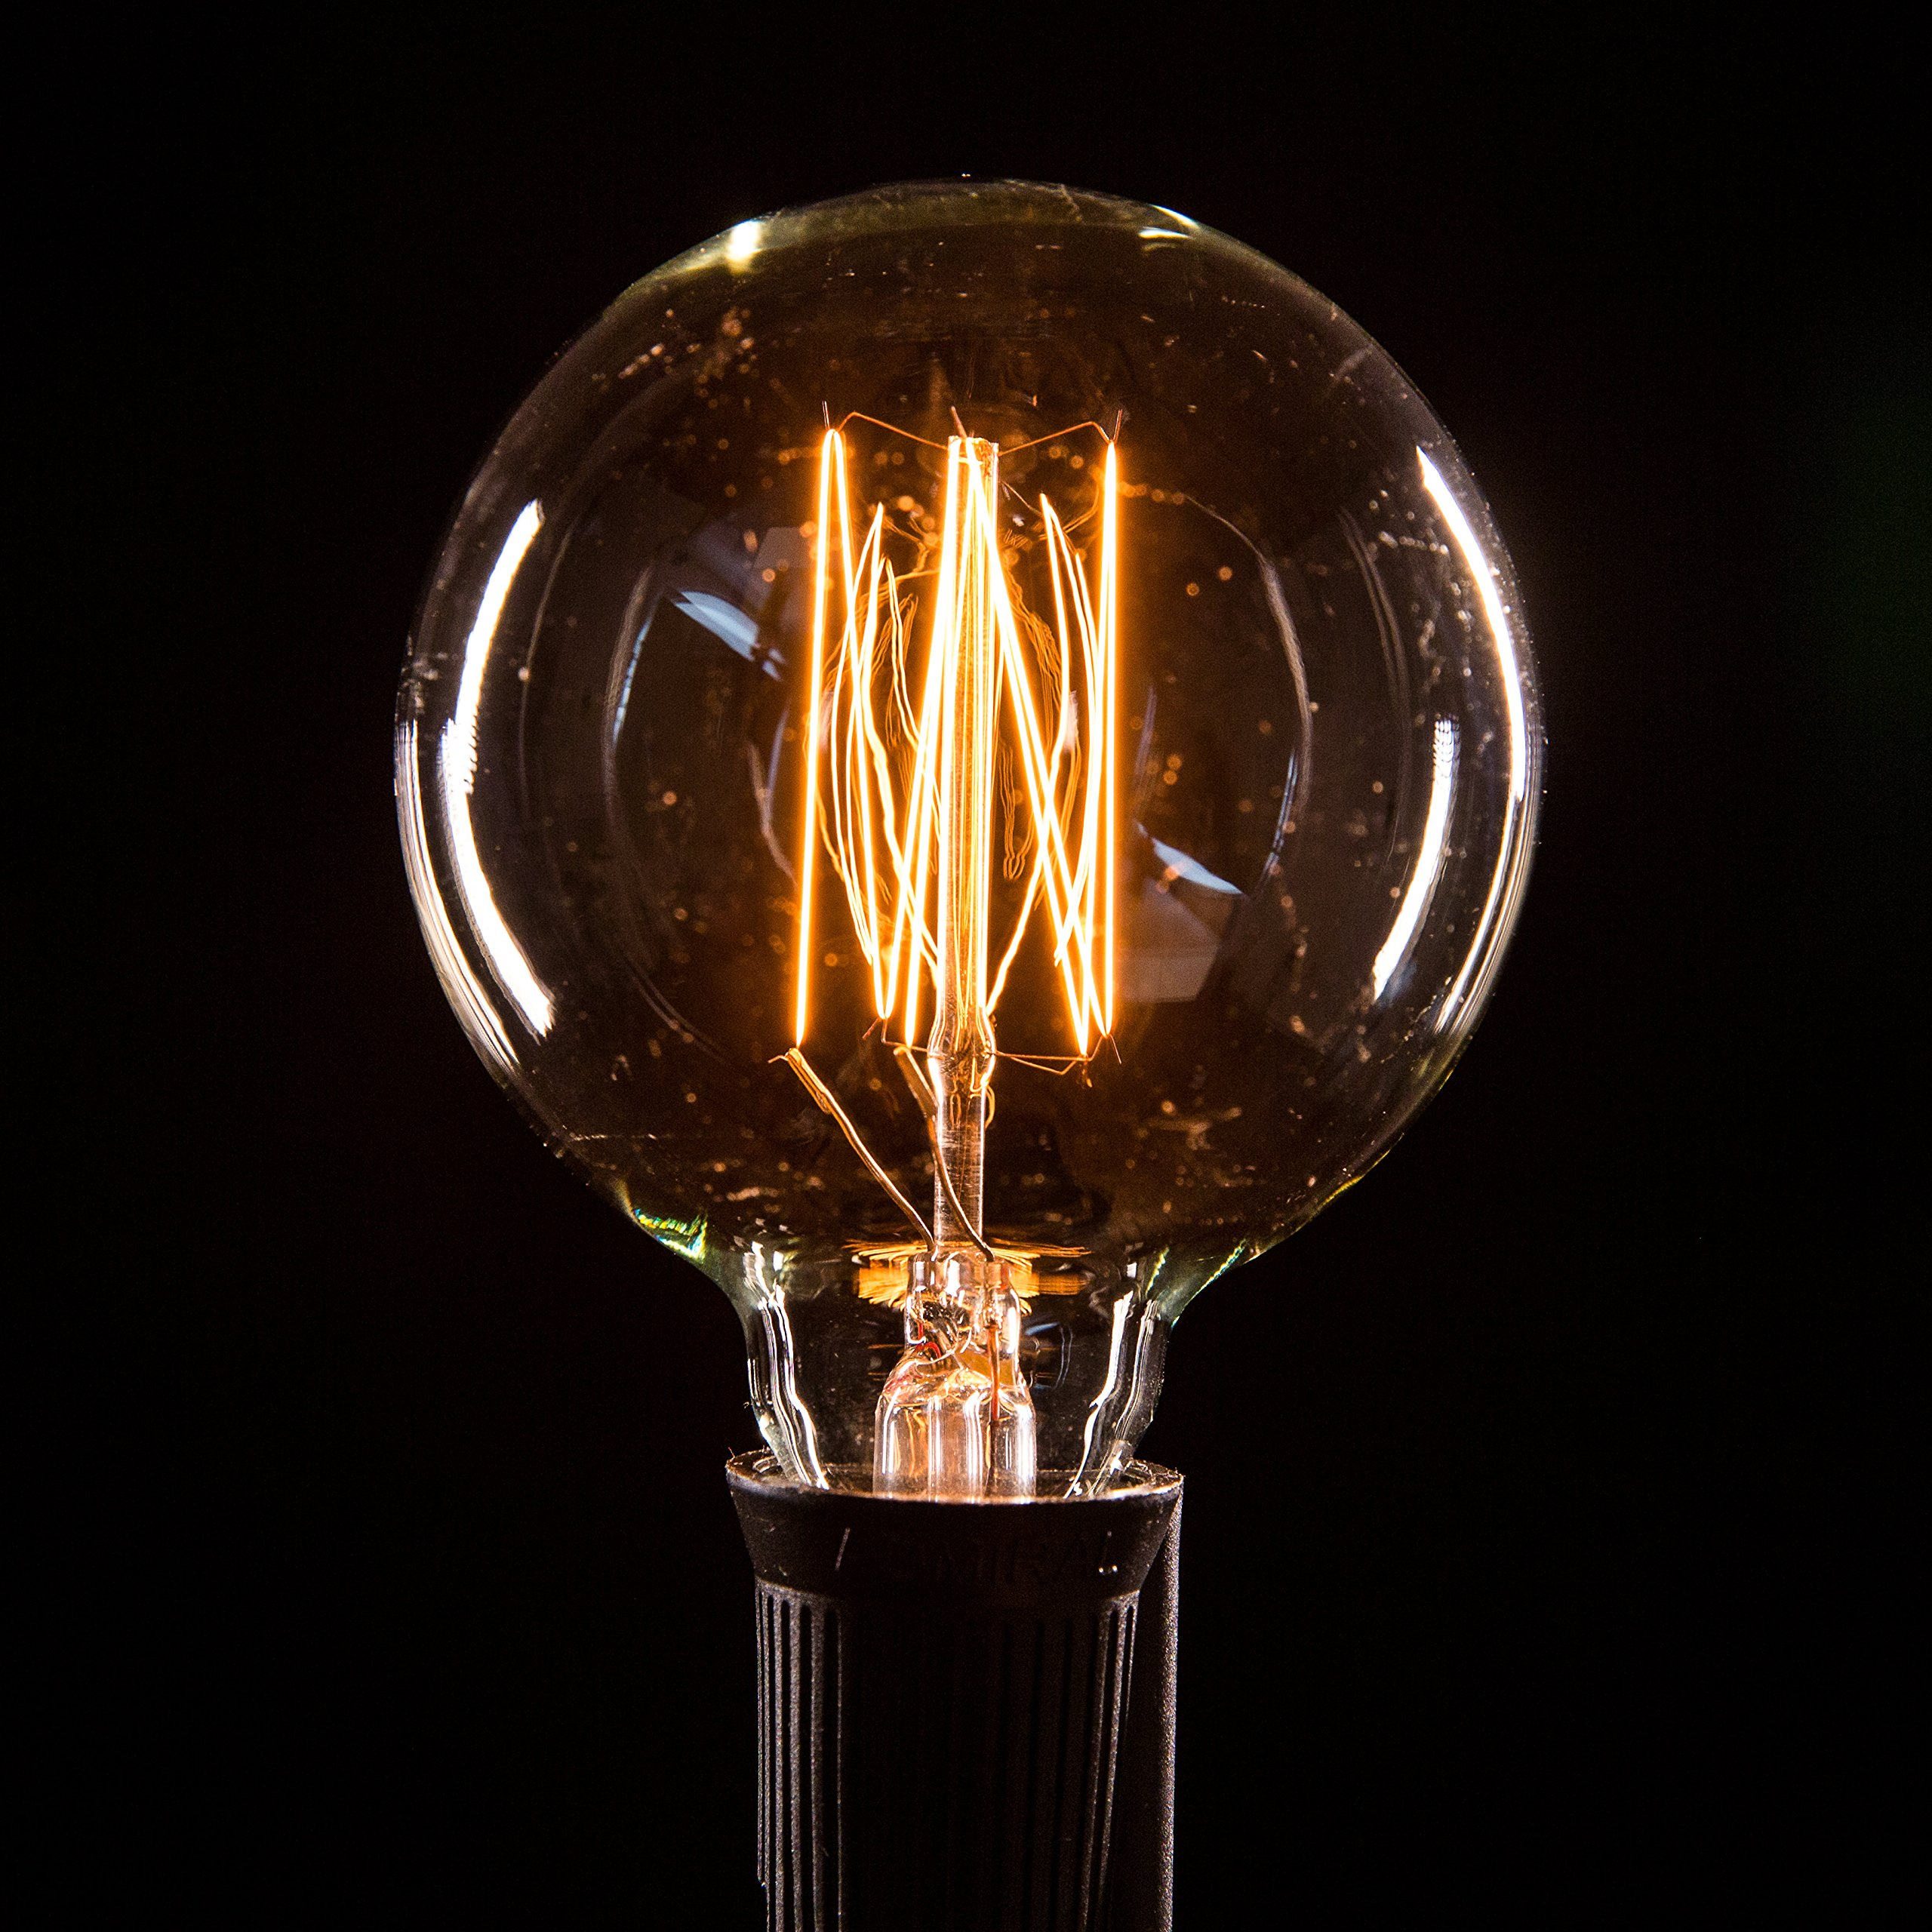 Box of 25 G60 Lantern Edison 2.5 Inch 7 Watt C9 E17 Base Replacement Bulbs